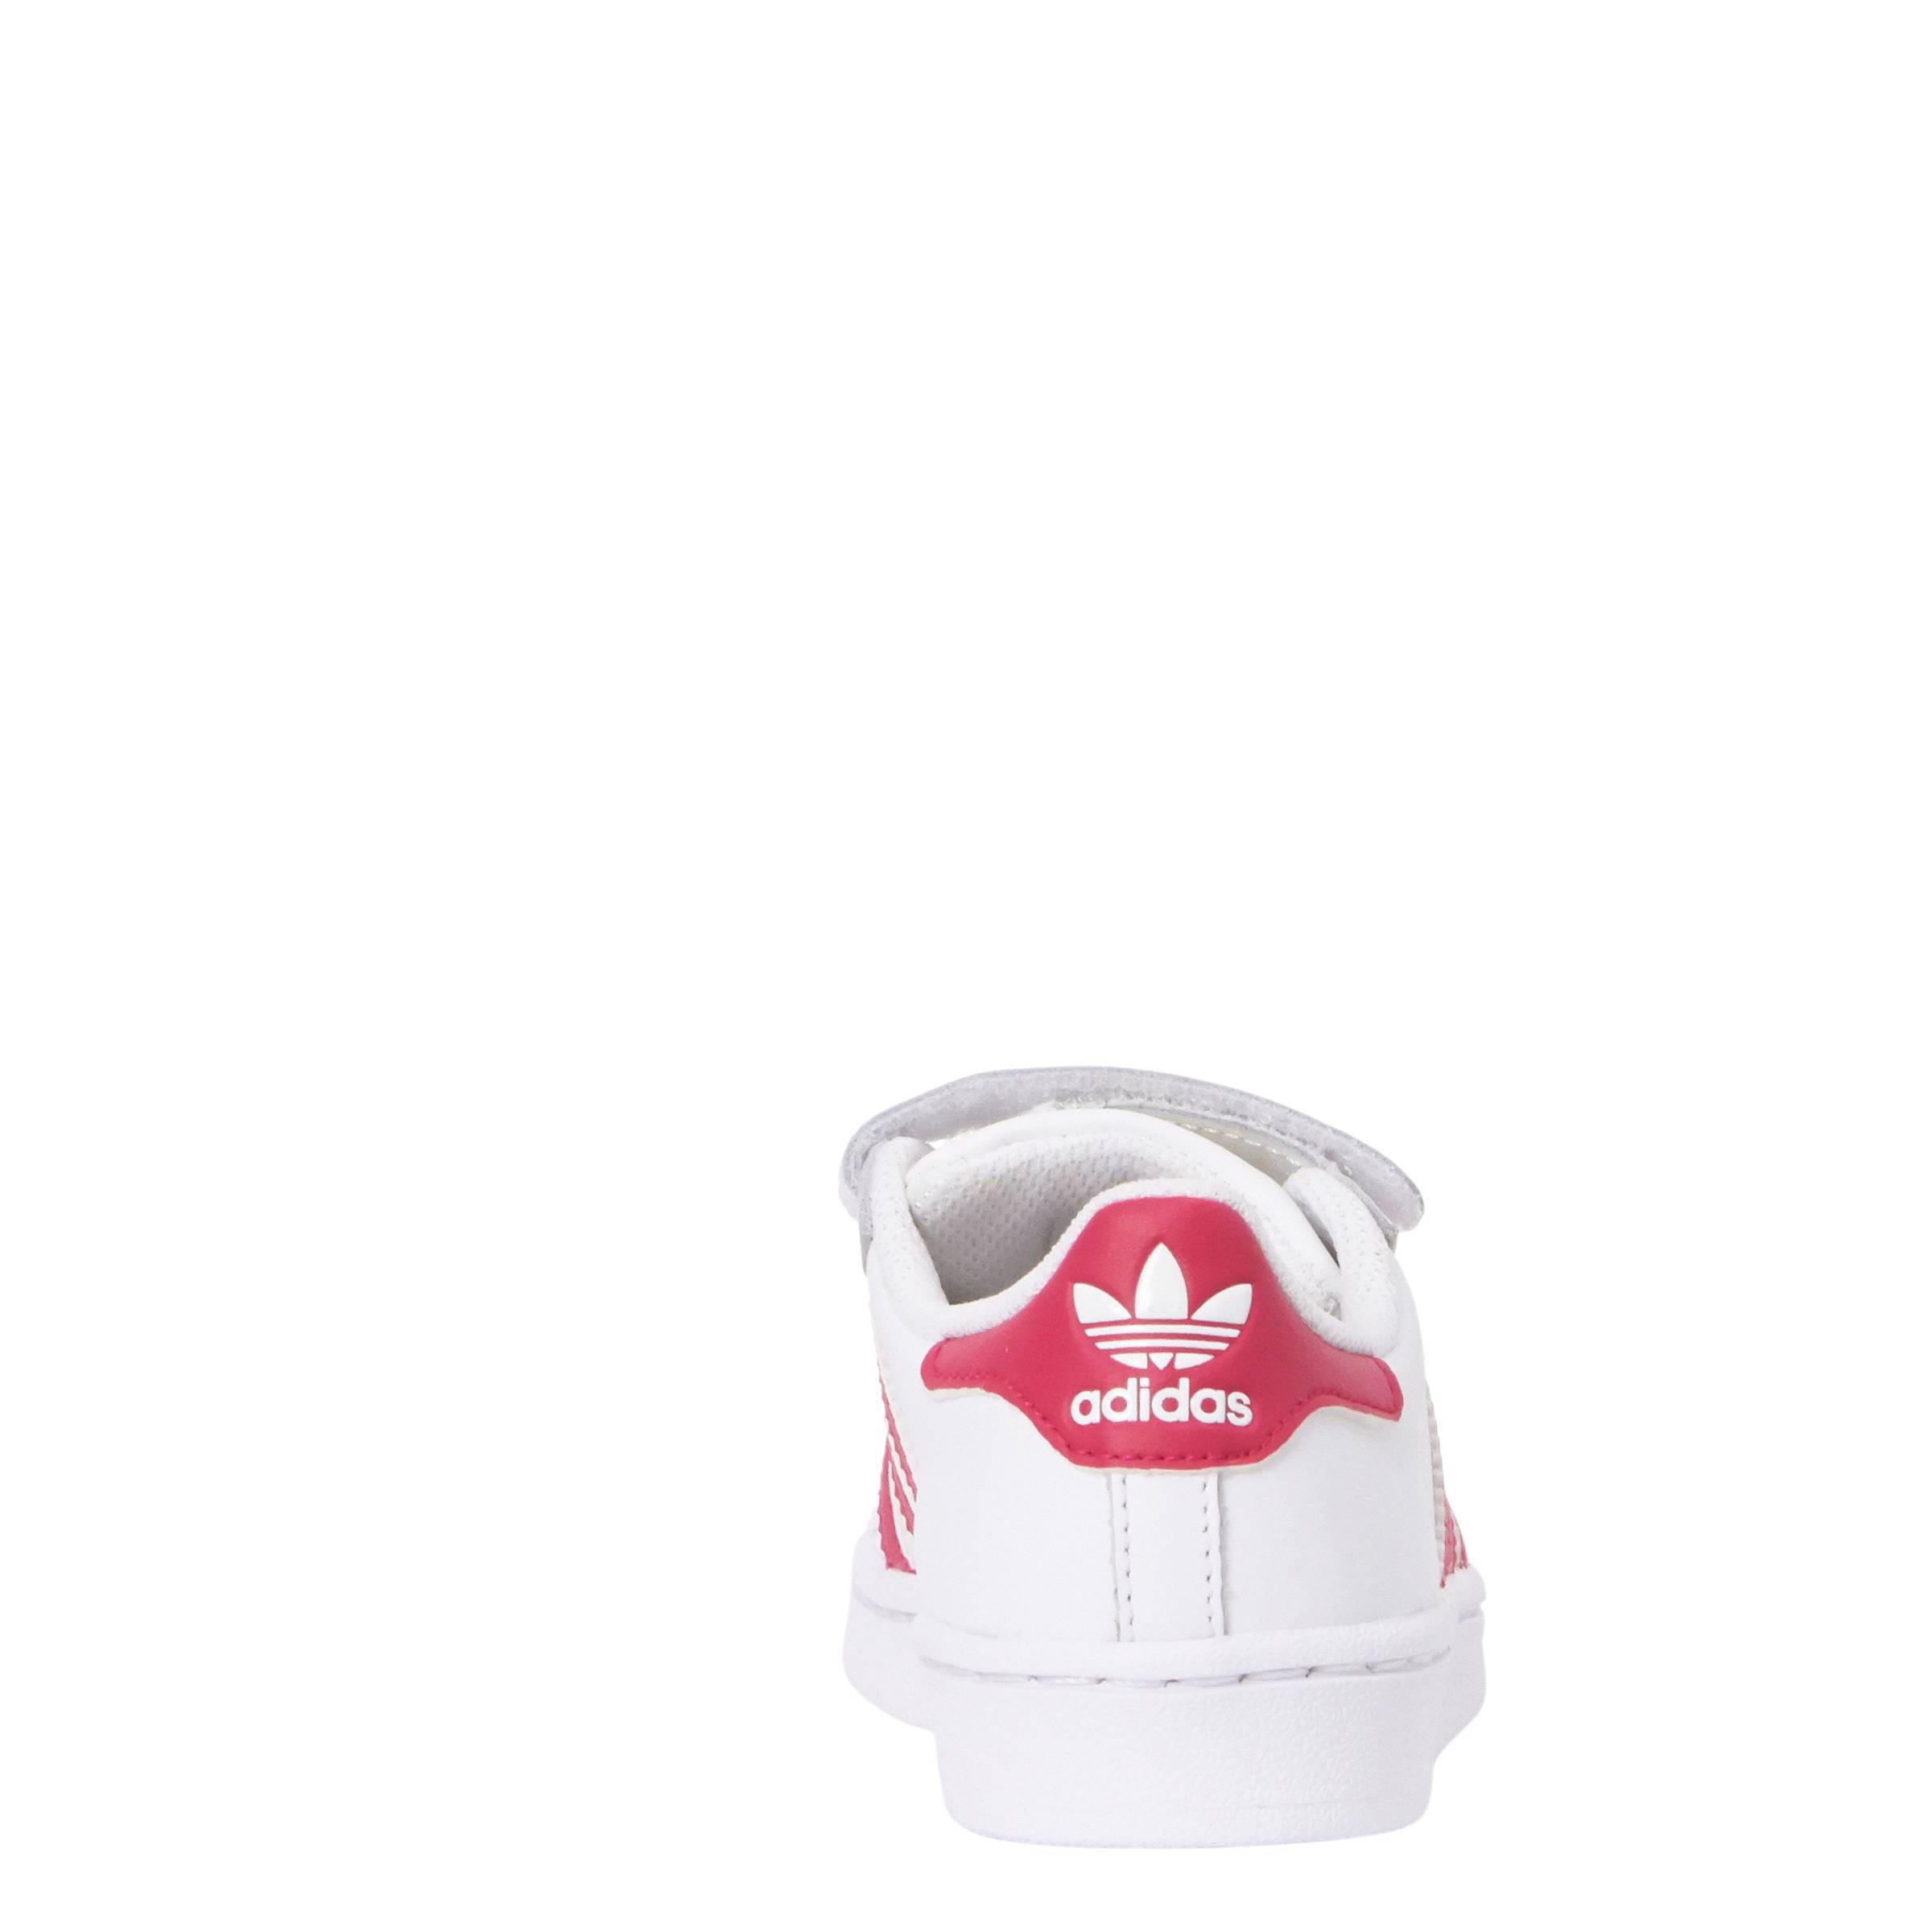 4c8b4b2e4f4 adidas originals Superstar Foundation C sneakers   wehkamp